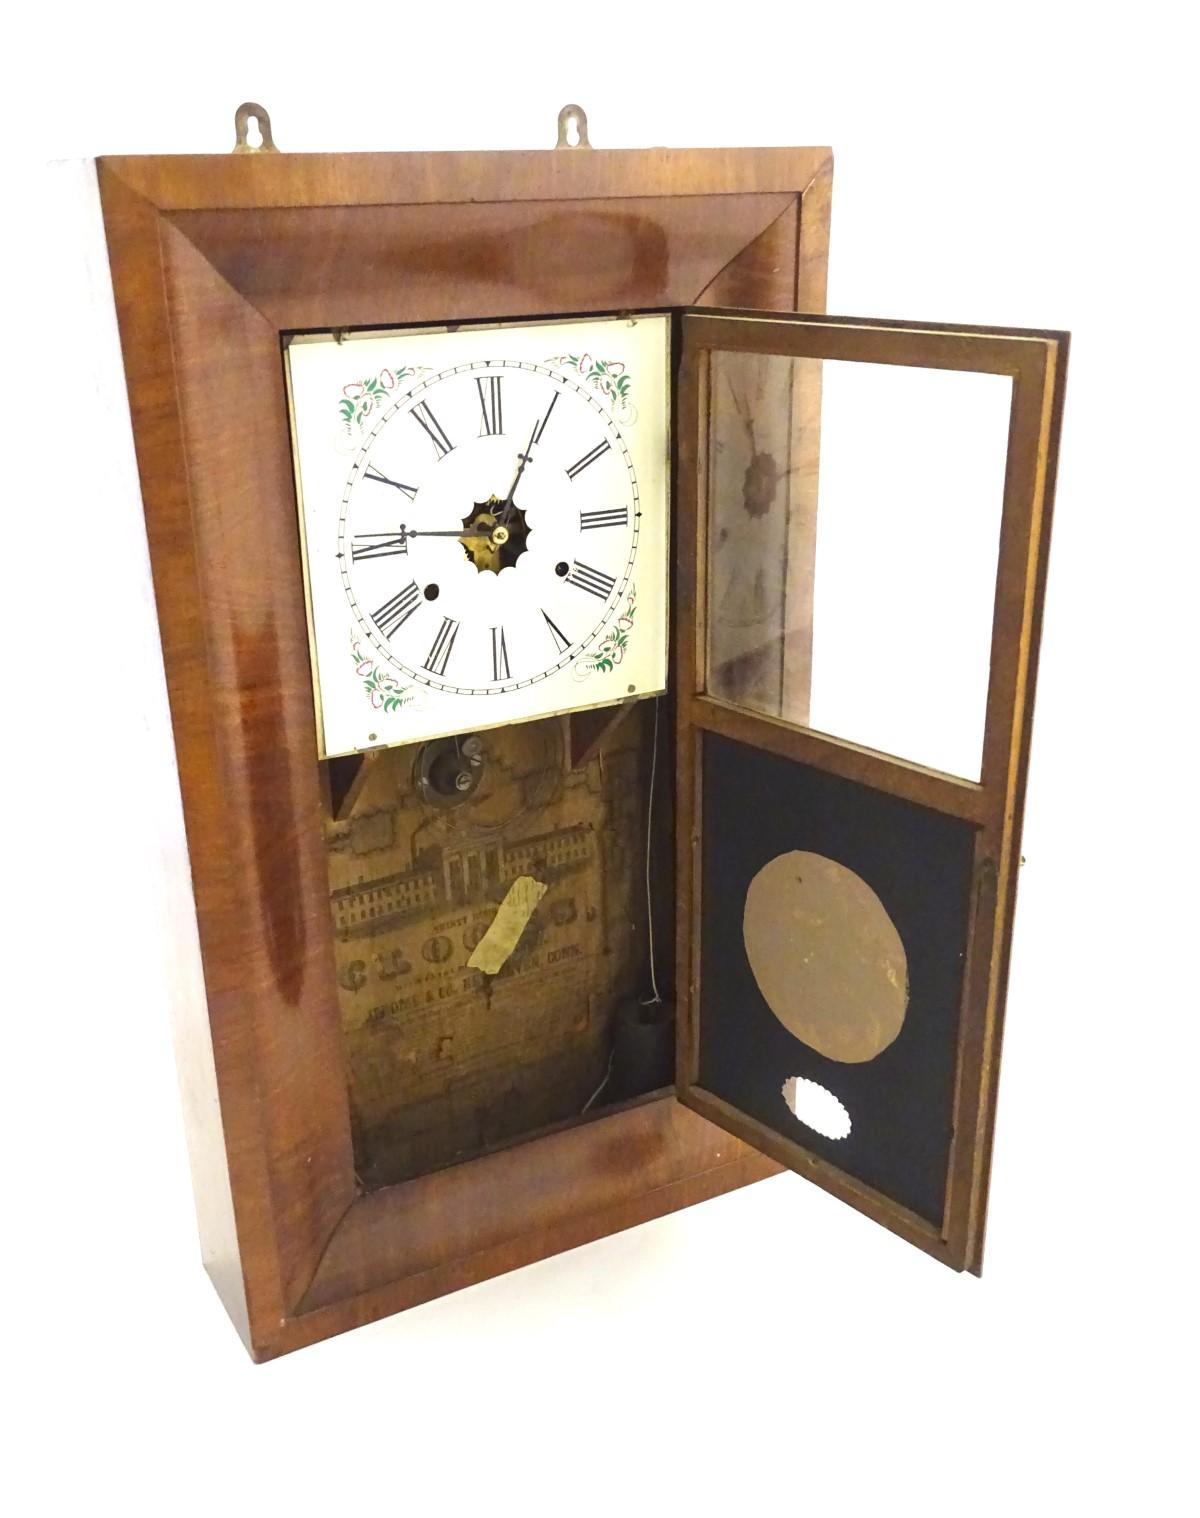 Lot 28 - Wall Clock : a mahogany American 'Kipper ' 8 day Wall Clock marked ' Jerome & Co , New Haven , Conn.